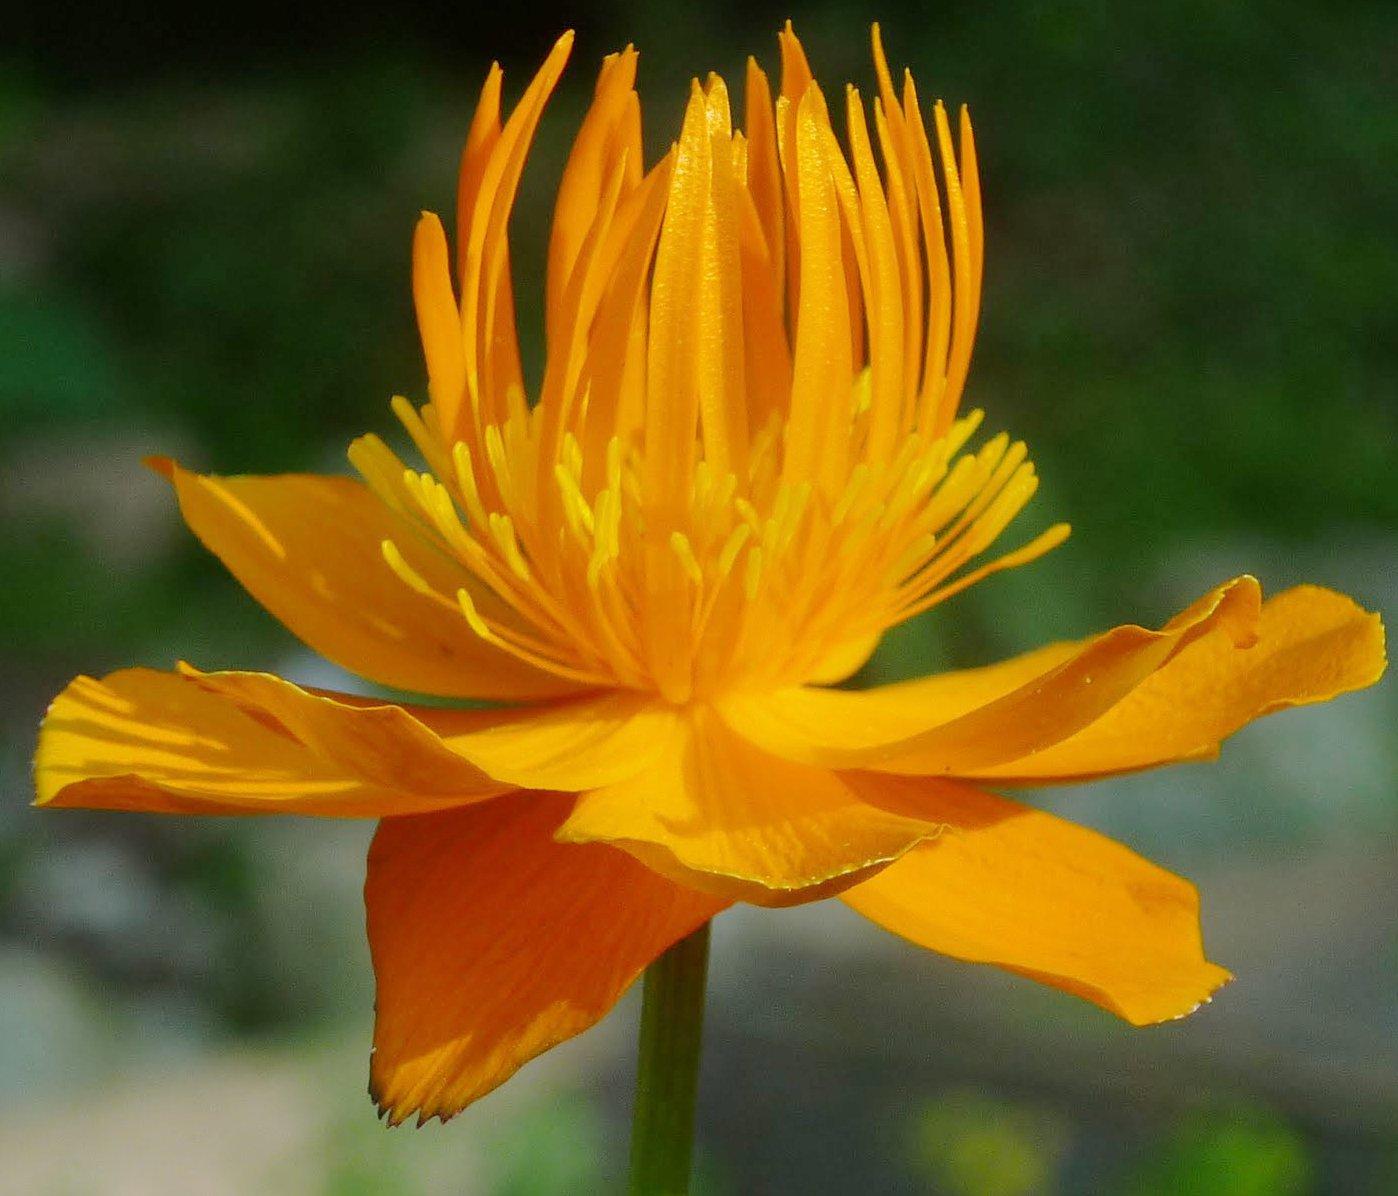 Chinese Globeflower Troll Flower Trollius chinensis 'Golden Queen' Rare - 25 Seeds